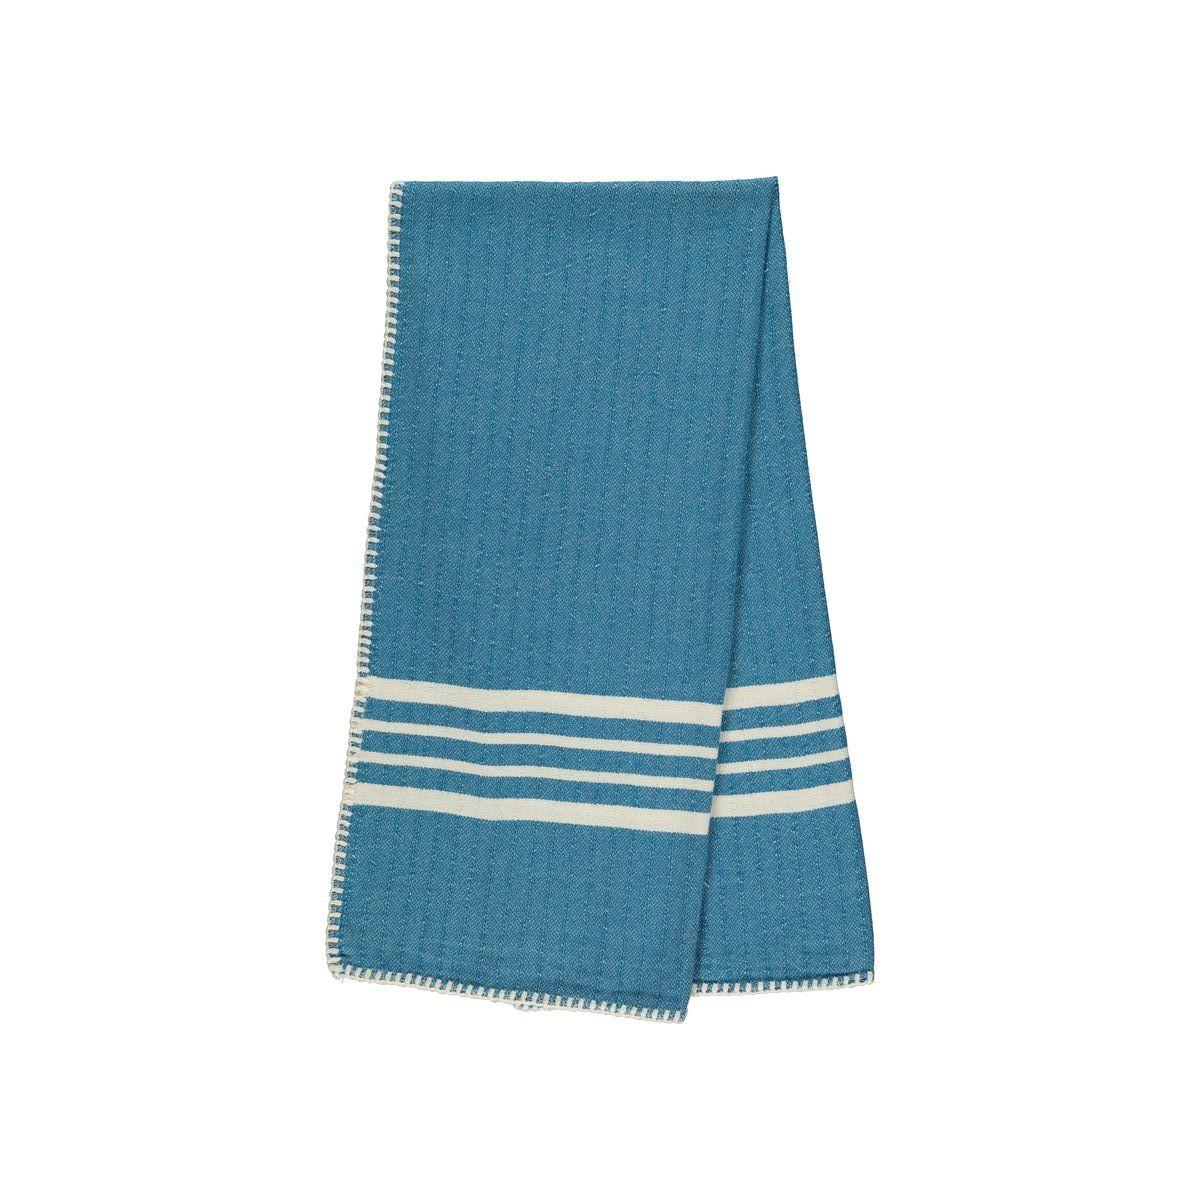 Peshkir Sultan - Stitched / Petrol Blue